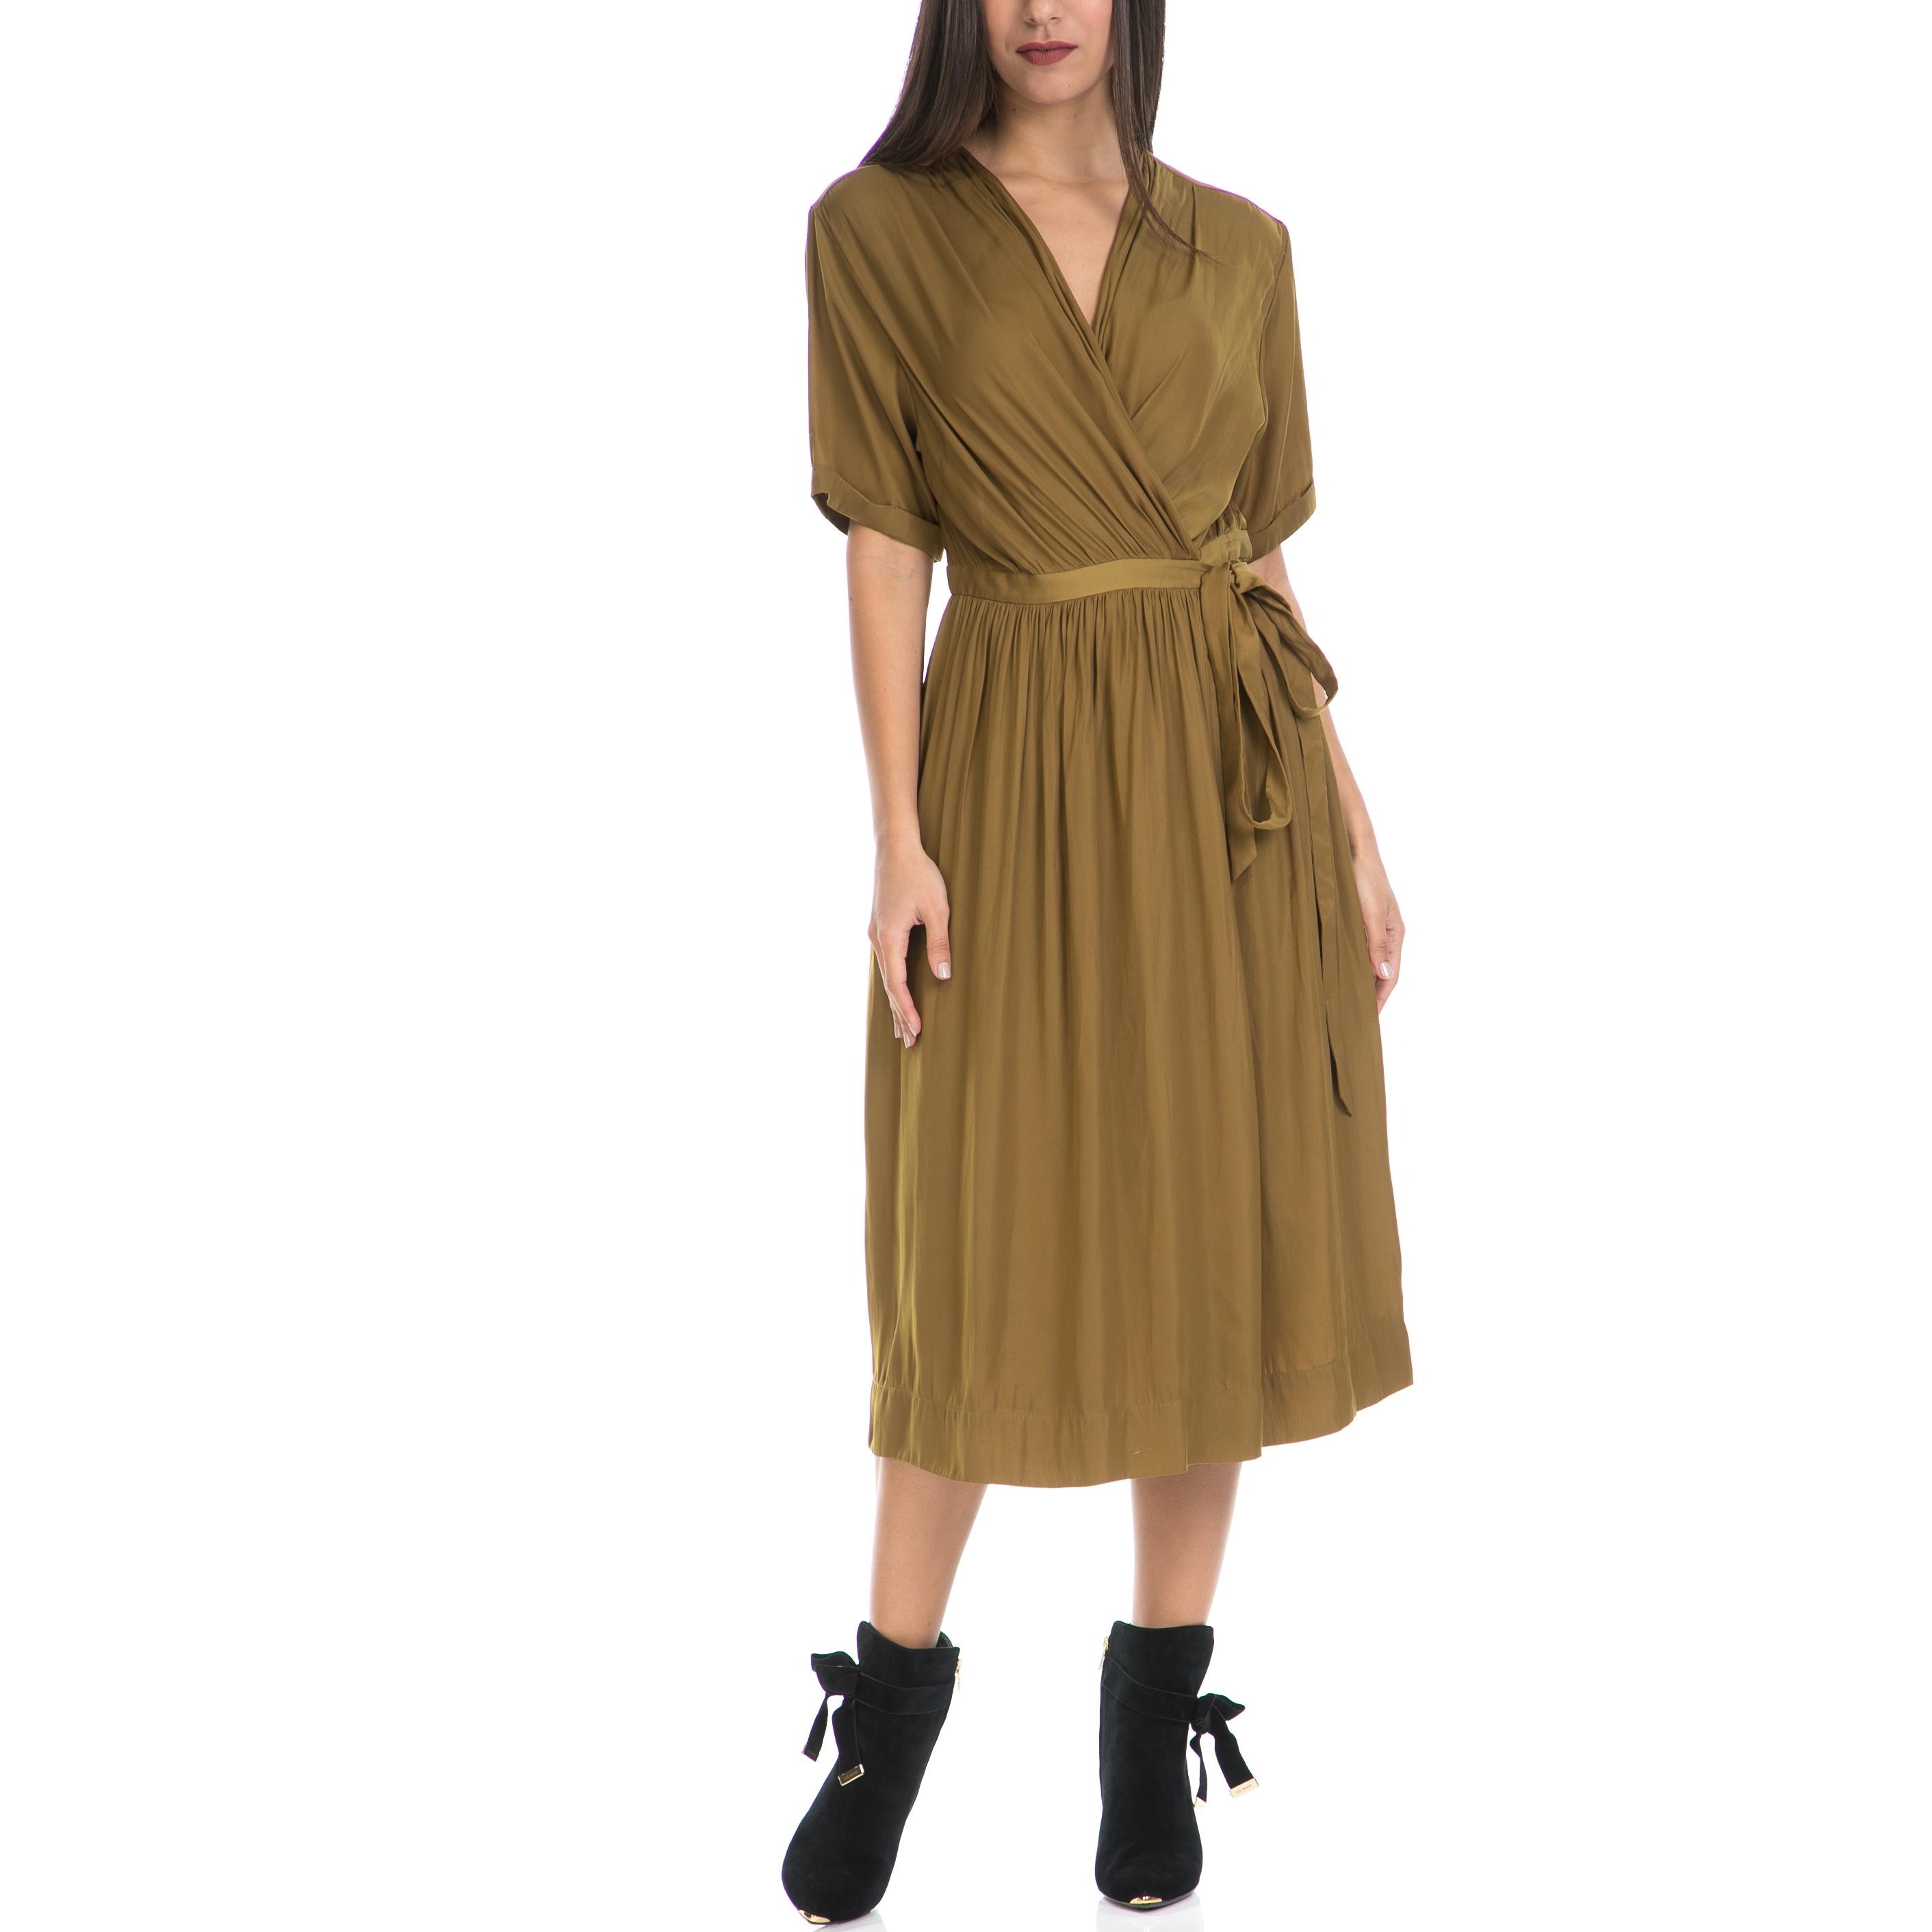 SCOTCH & SODA - Γυναικείο φόρεμα MAISON SCOTCH χακί γυναικεία ρούχα φορέματα μάξι